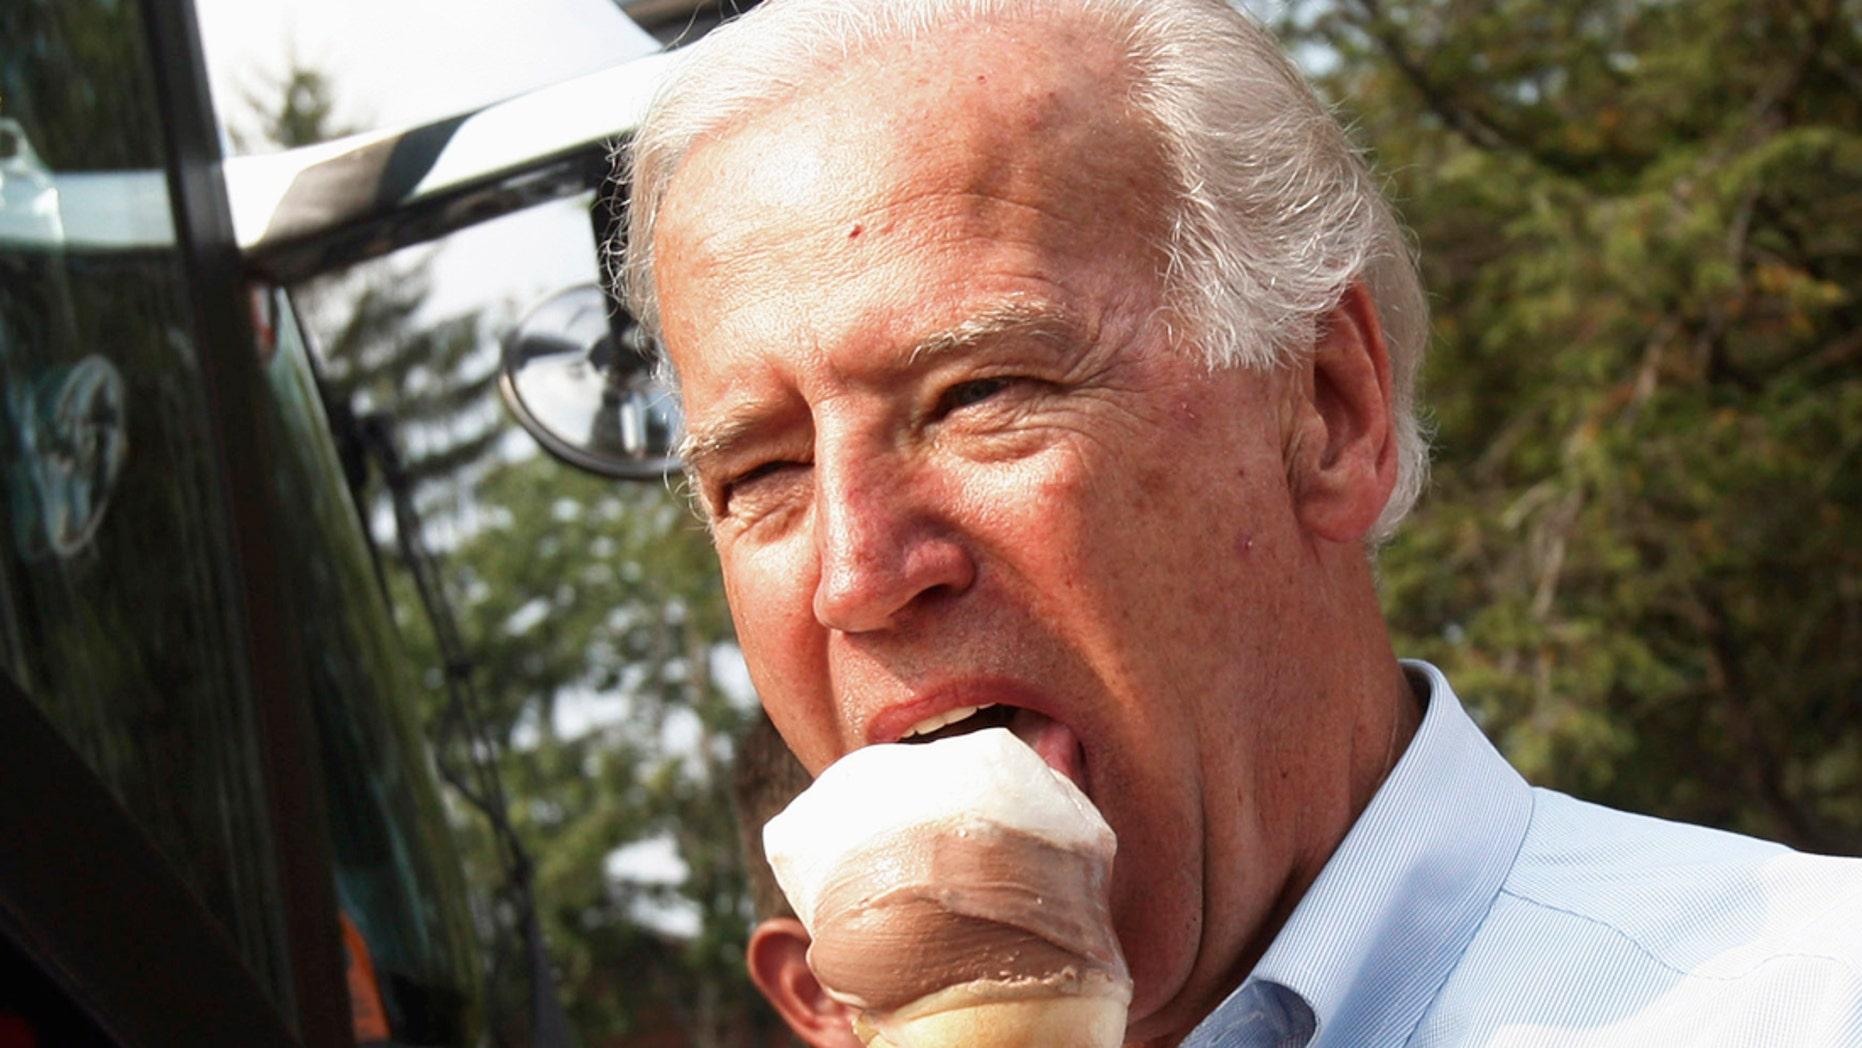 Ice cream lover Joe Biden is finally getting his own flavor